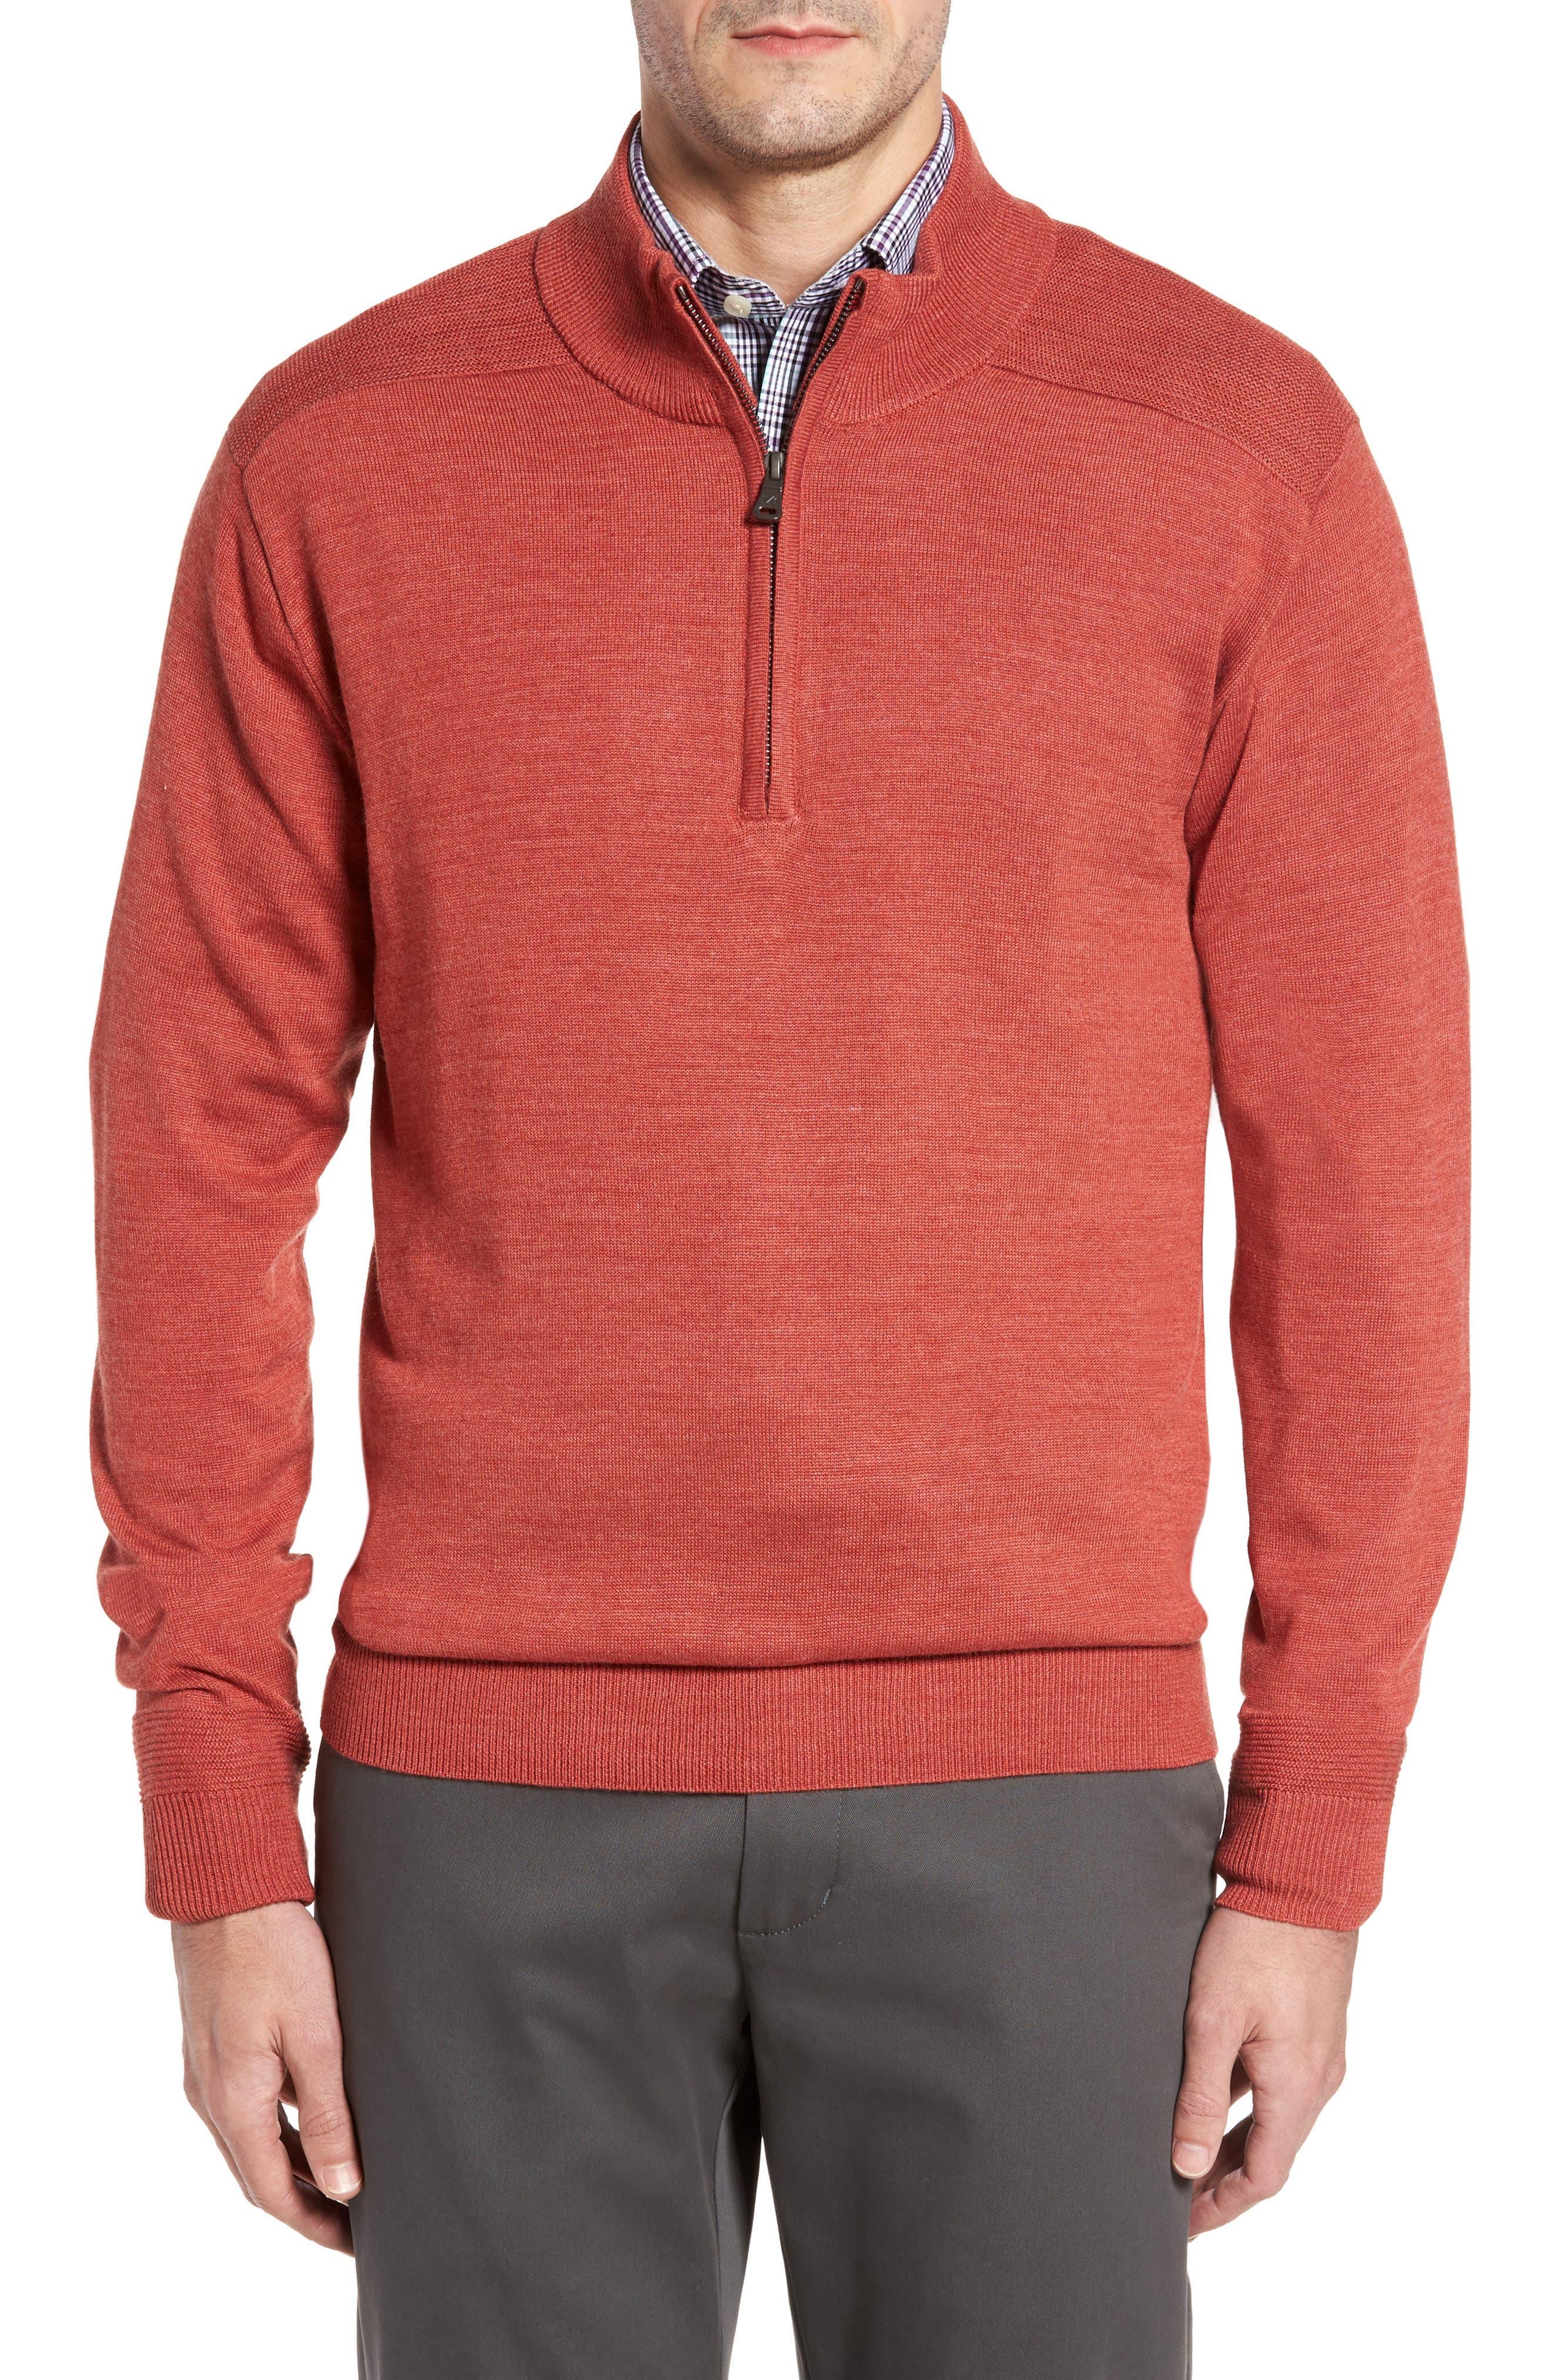 Douglas Quarter Zip Wool Blend Sweater,                             Main thumbnail 1, color,                             600